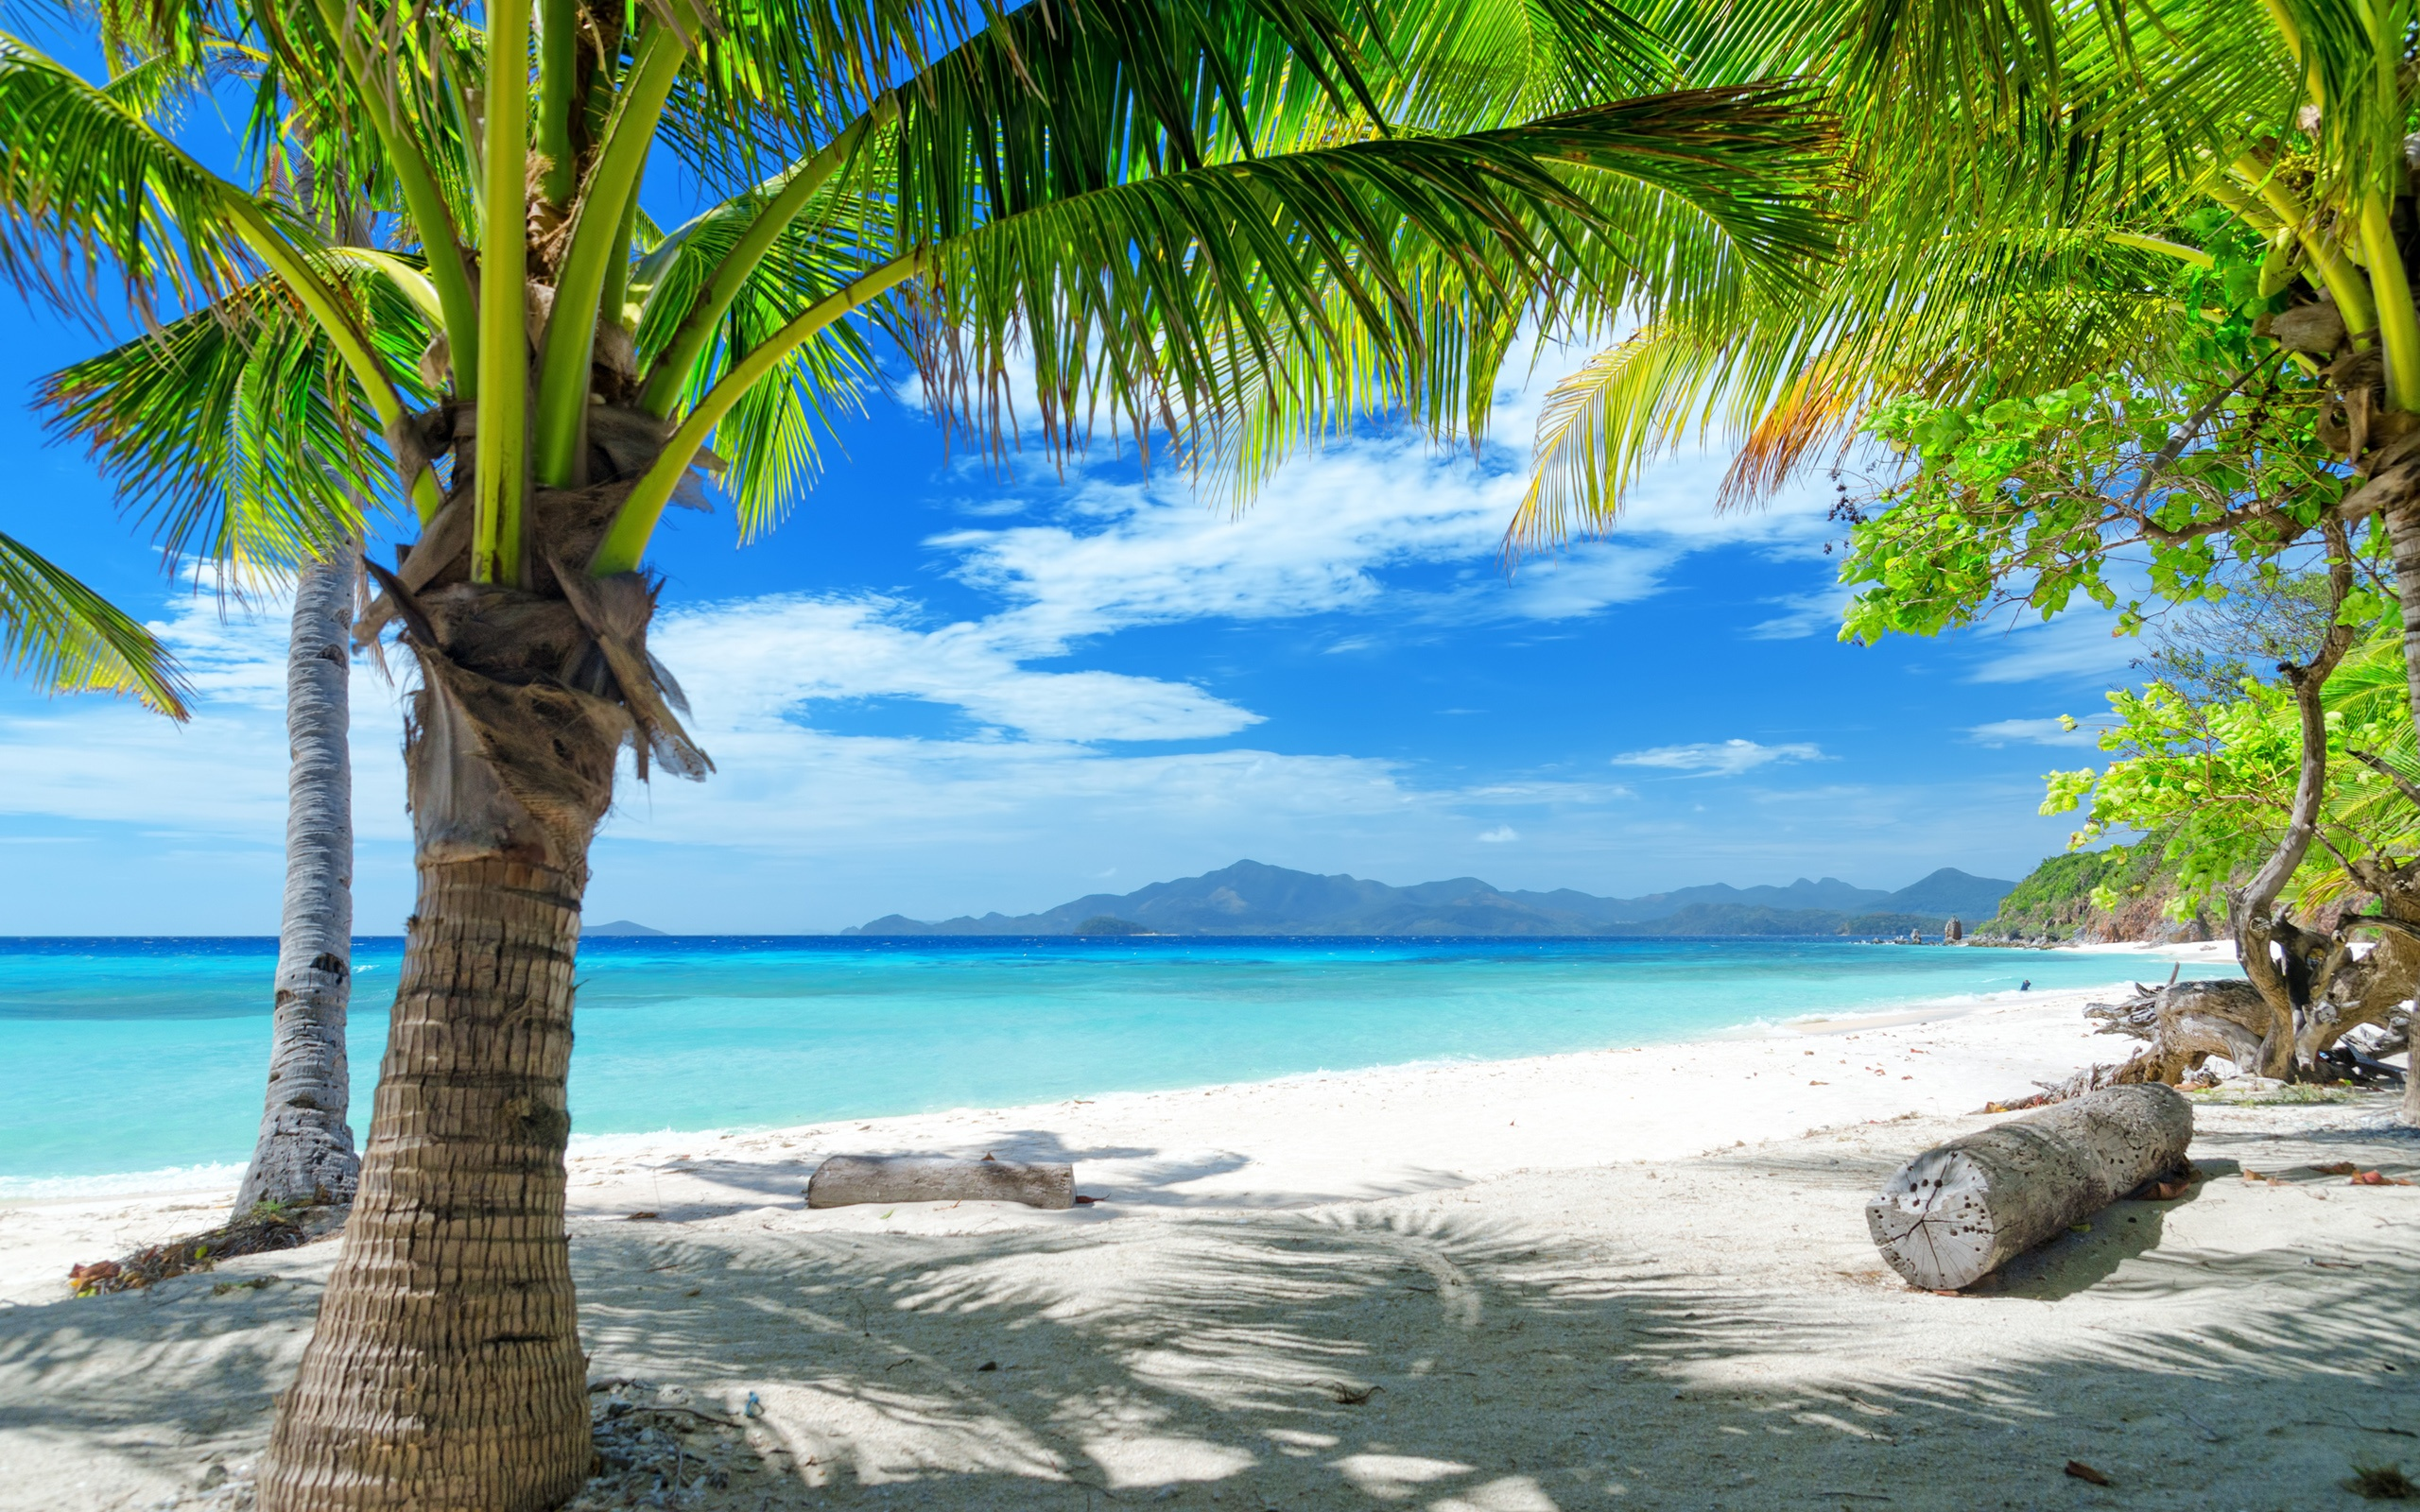 Hintergrundbild strand palmen